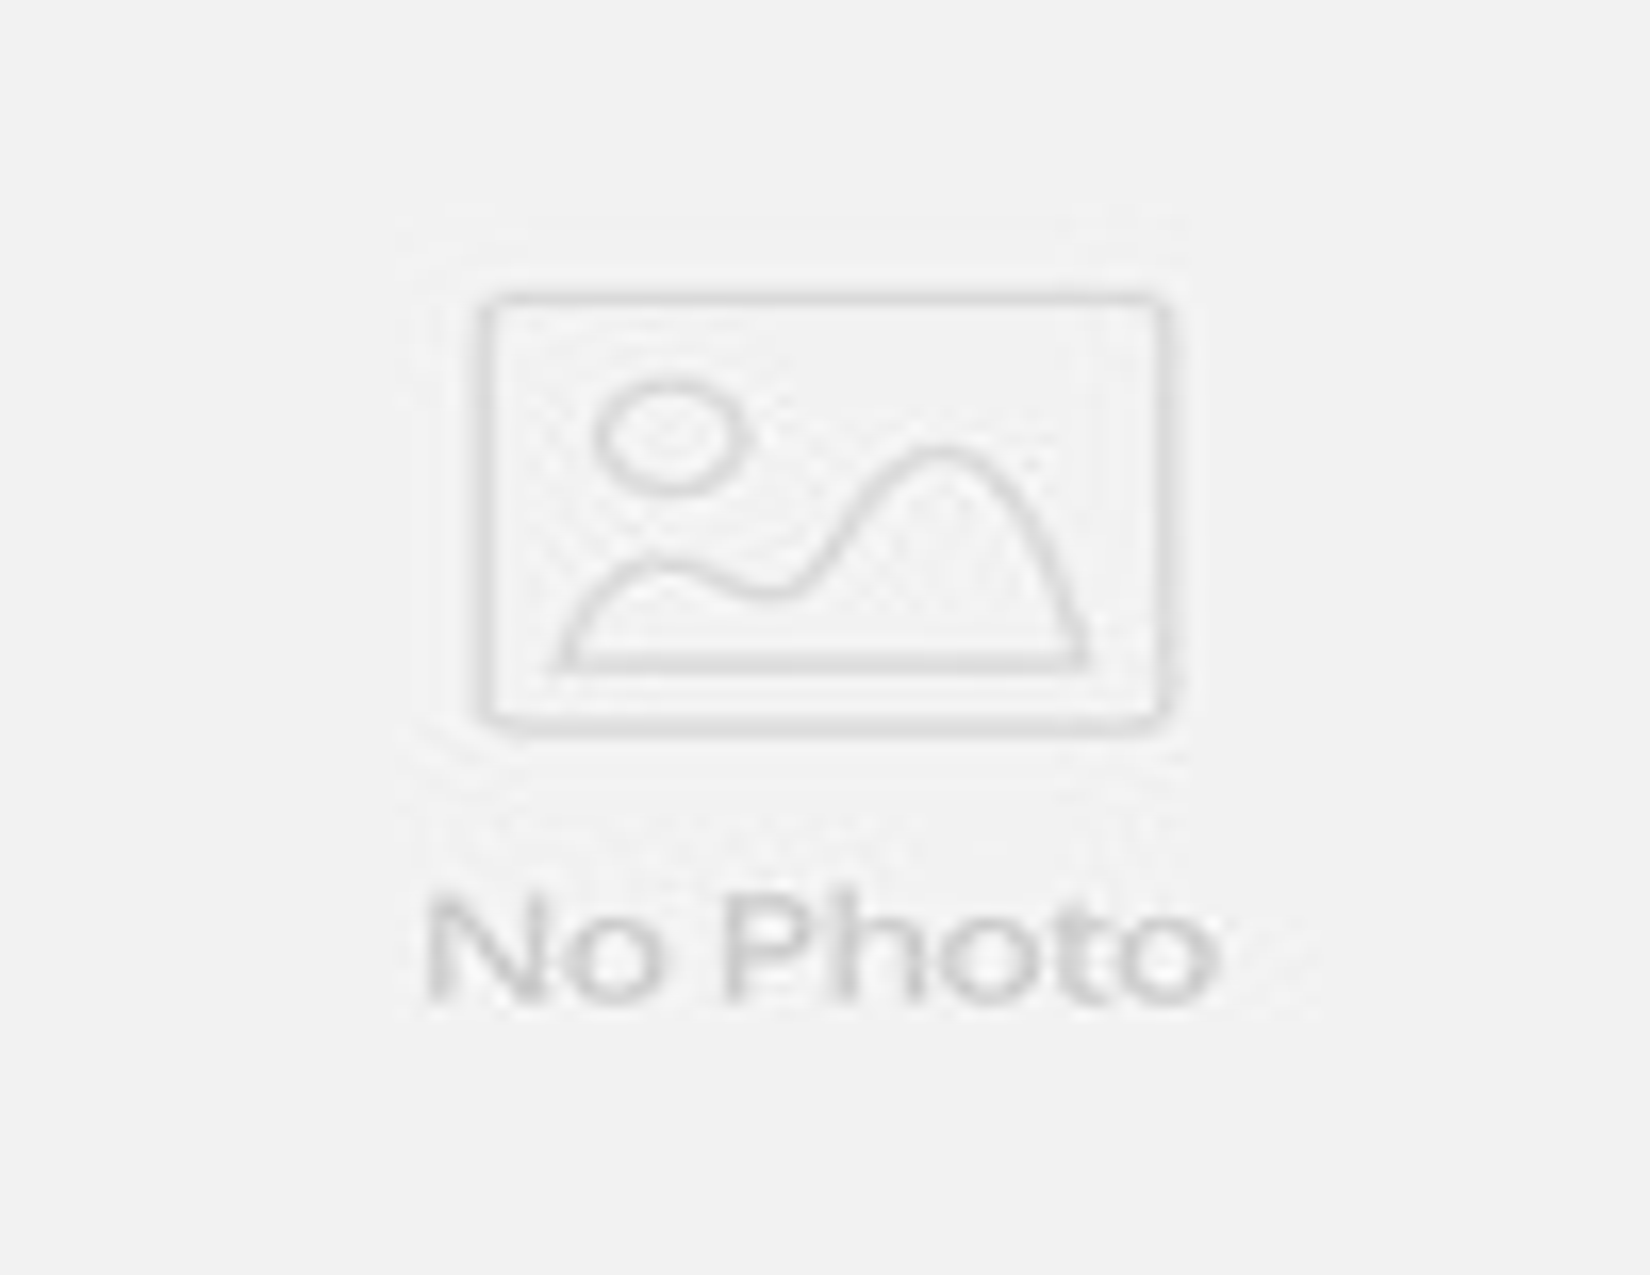 Lipat bahay / Truck for rent / trucking manila (09178401681 / 02-5027882 / 02-9759558